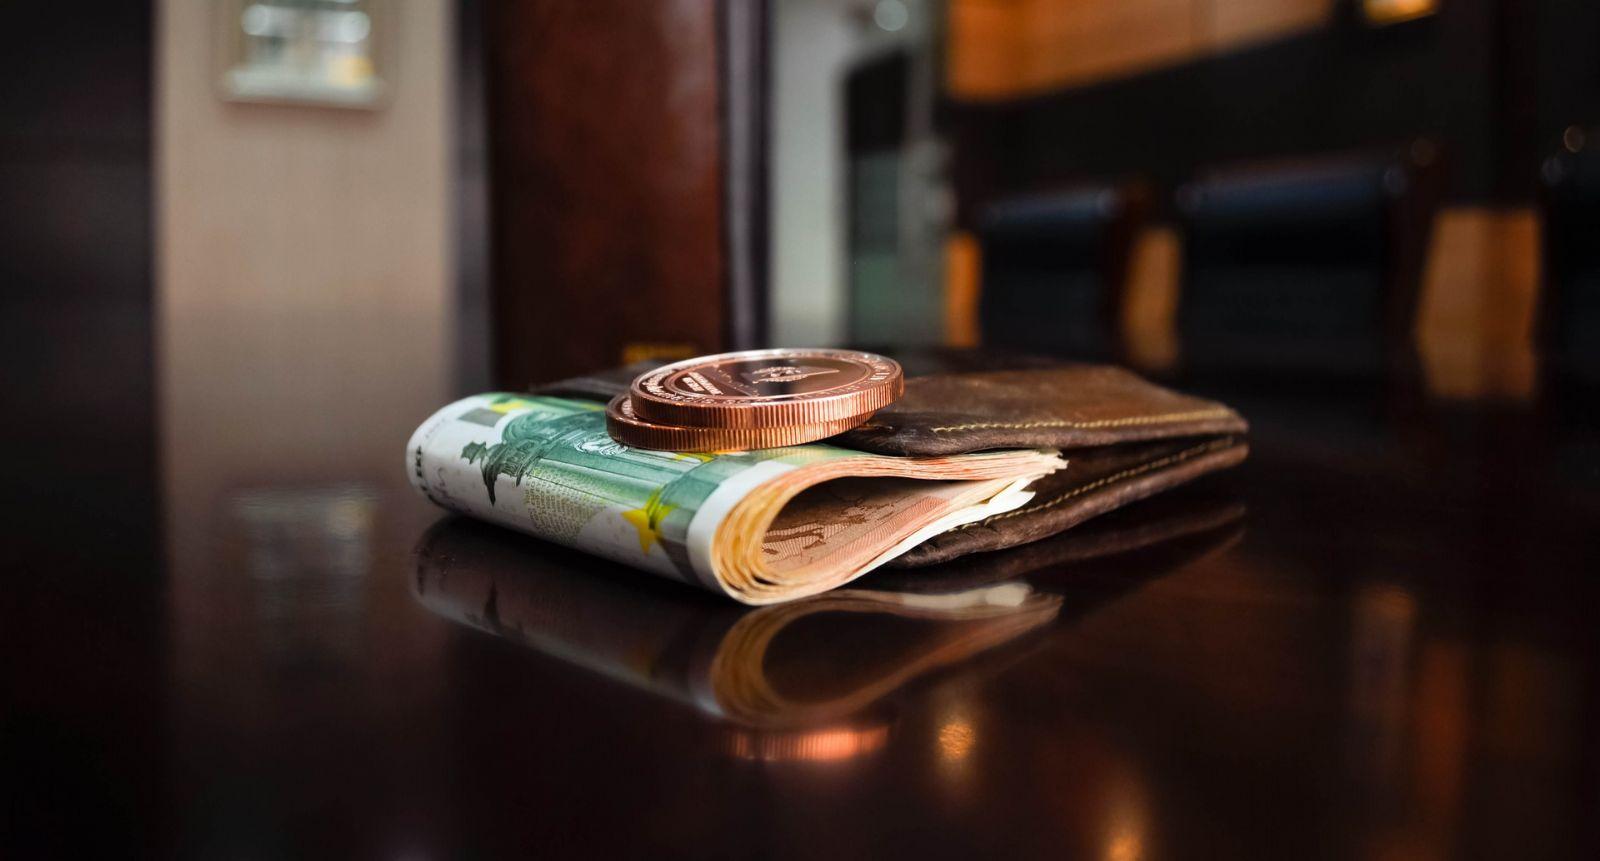 půjčky ihned bez registru que